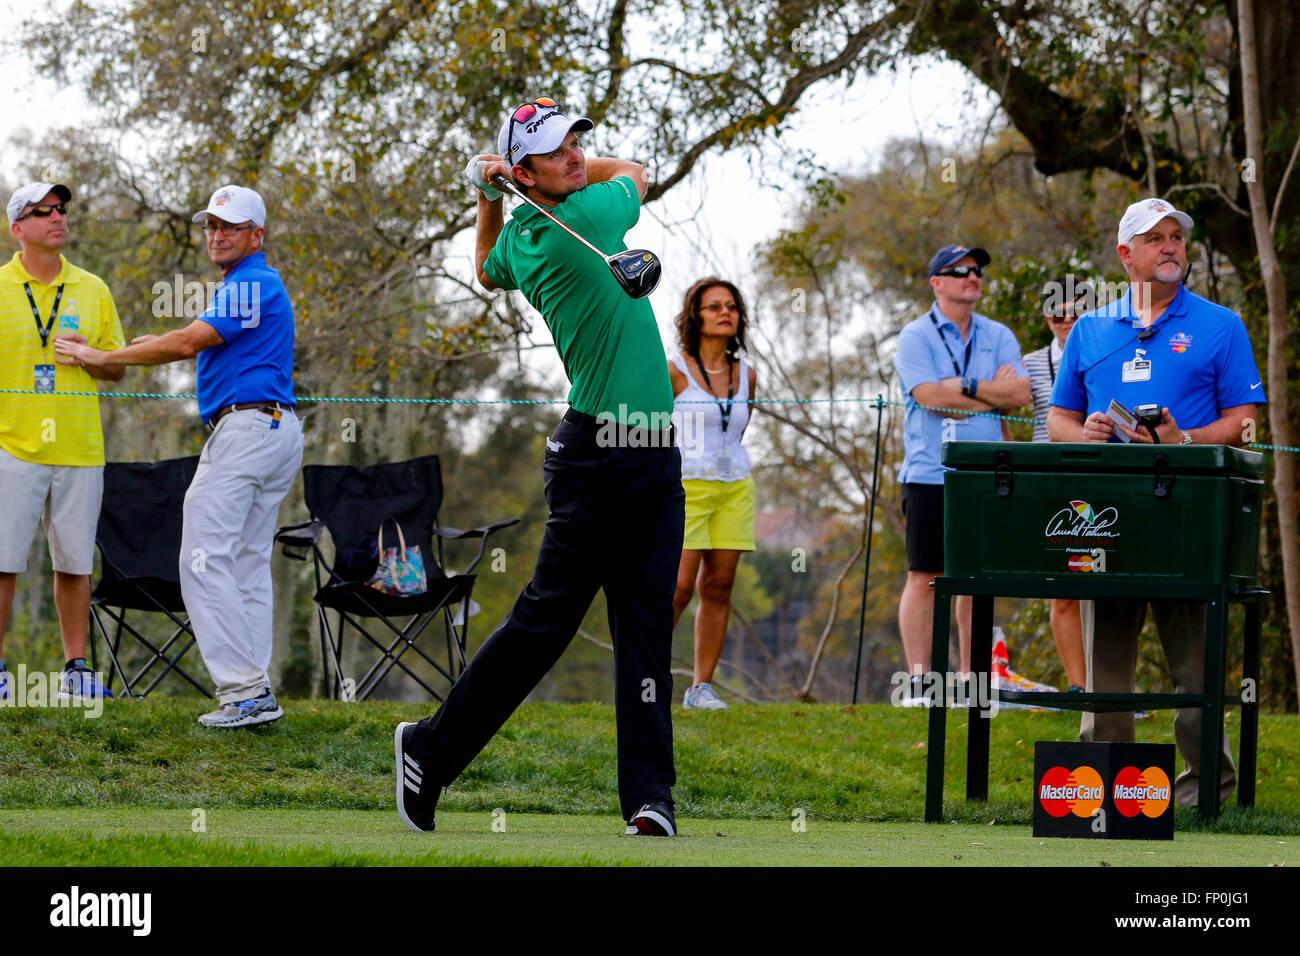 16th March, 2016. Justin Rose, English golfer playing at the Arnold Palmer Invitational Golf Tournament at Bay Hill Golf Club, Orlando, Florida Credit: ...